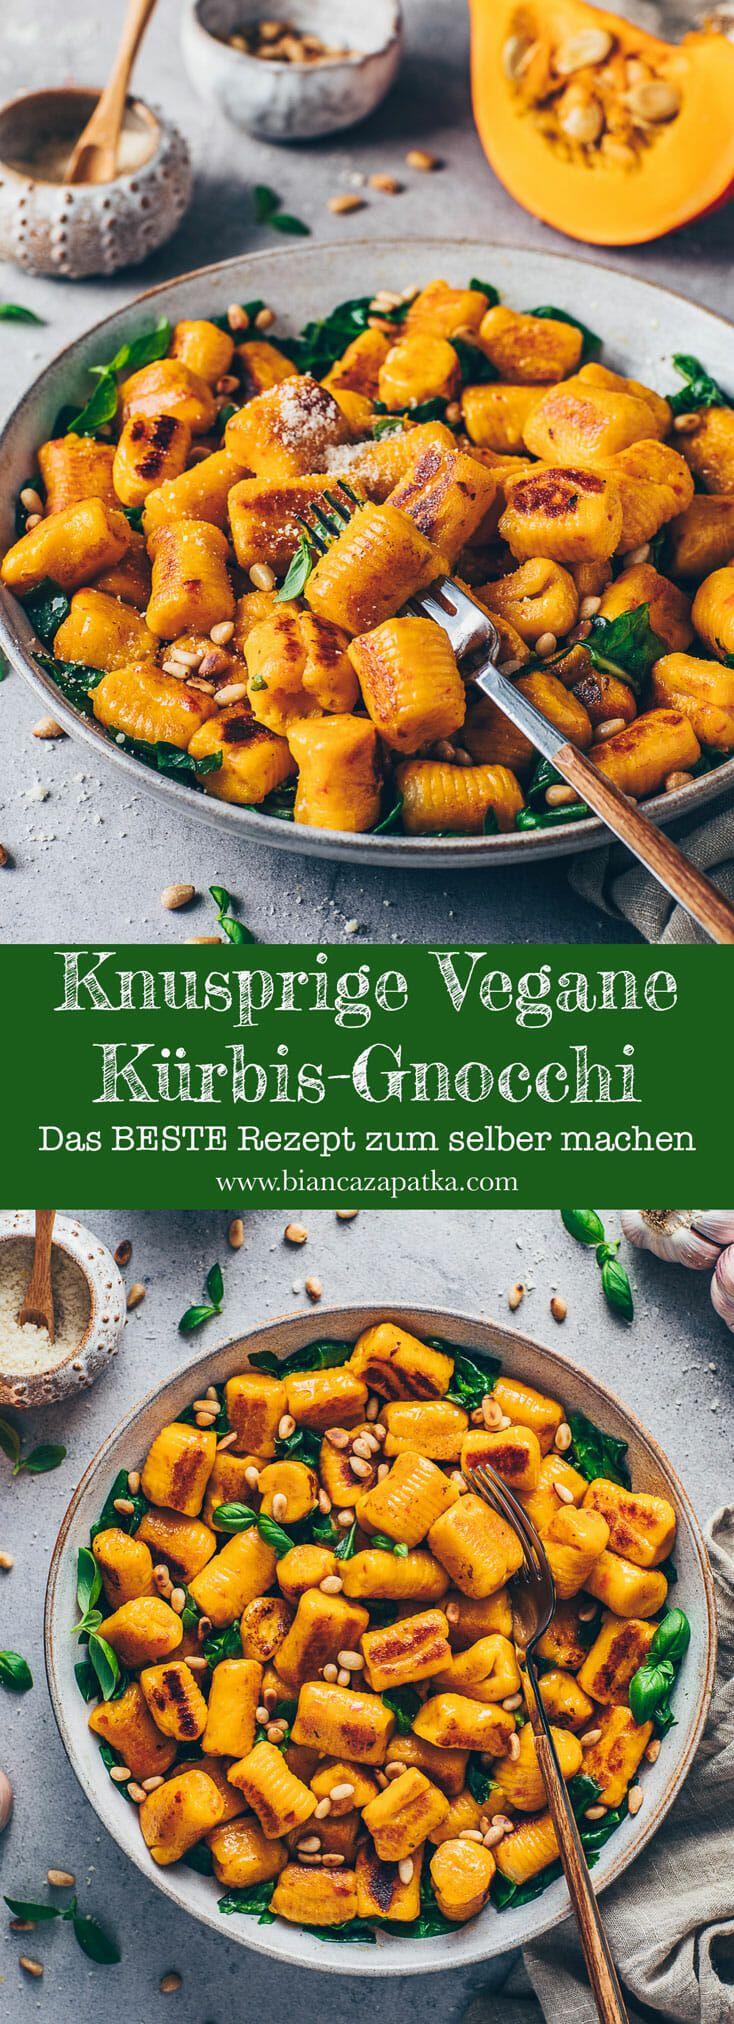 Kürbis Gnocchi Rezept | Vegan, Selbstgemacht - Bianca Zapatka | Rezepte